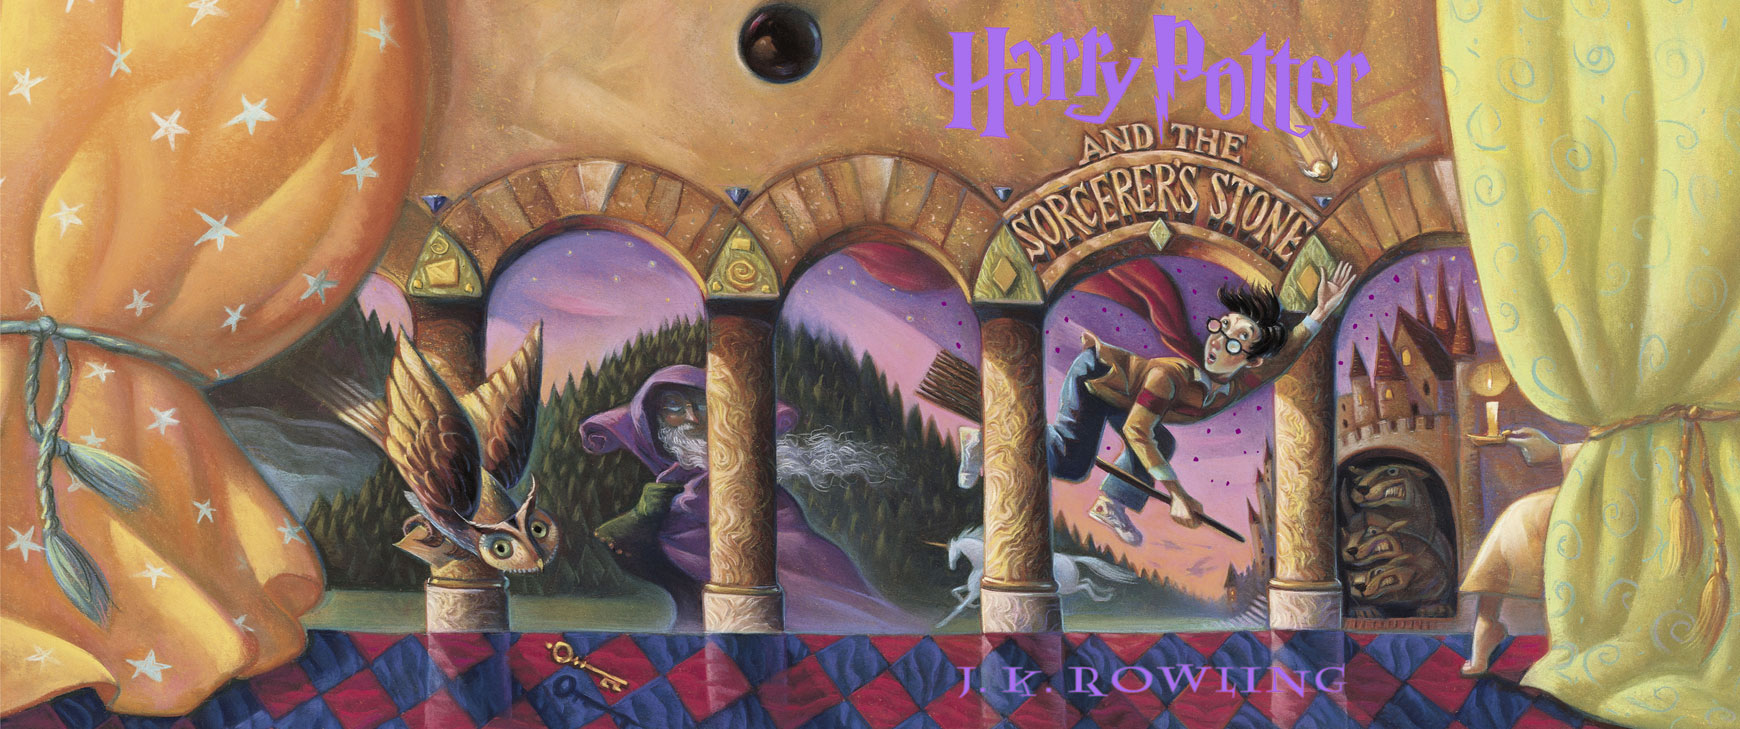 PS-Cover EN-US Original FullJacket.jpg